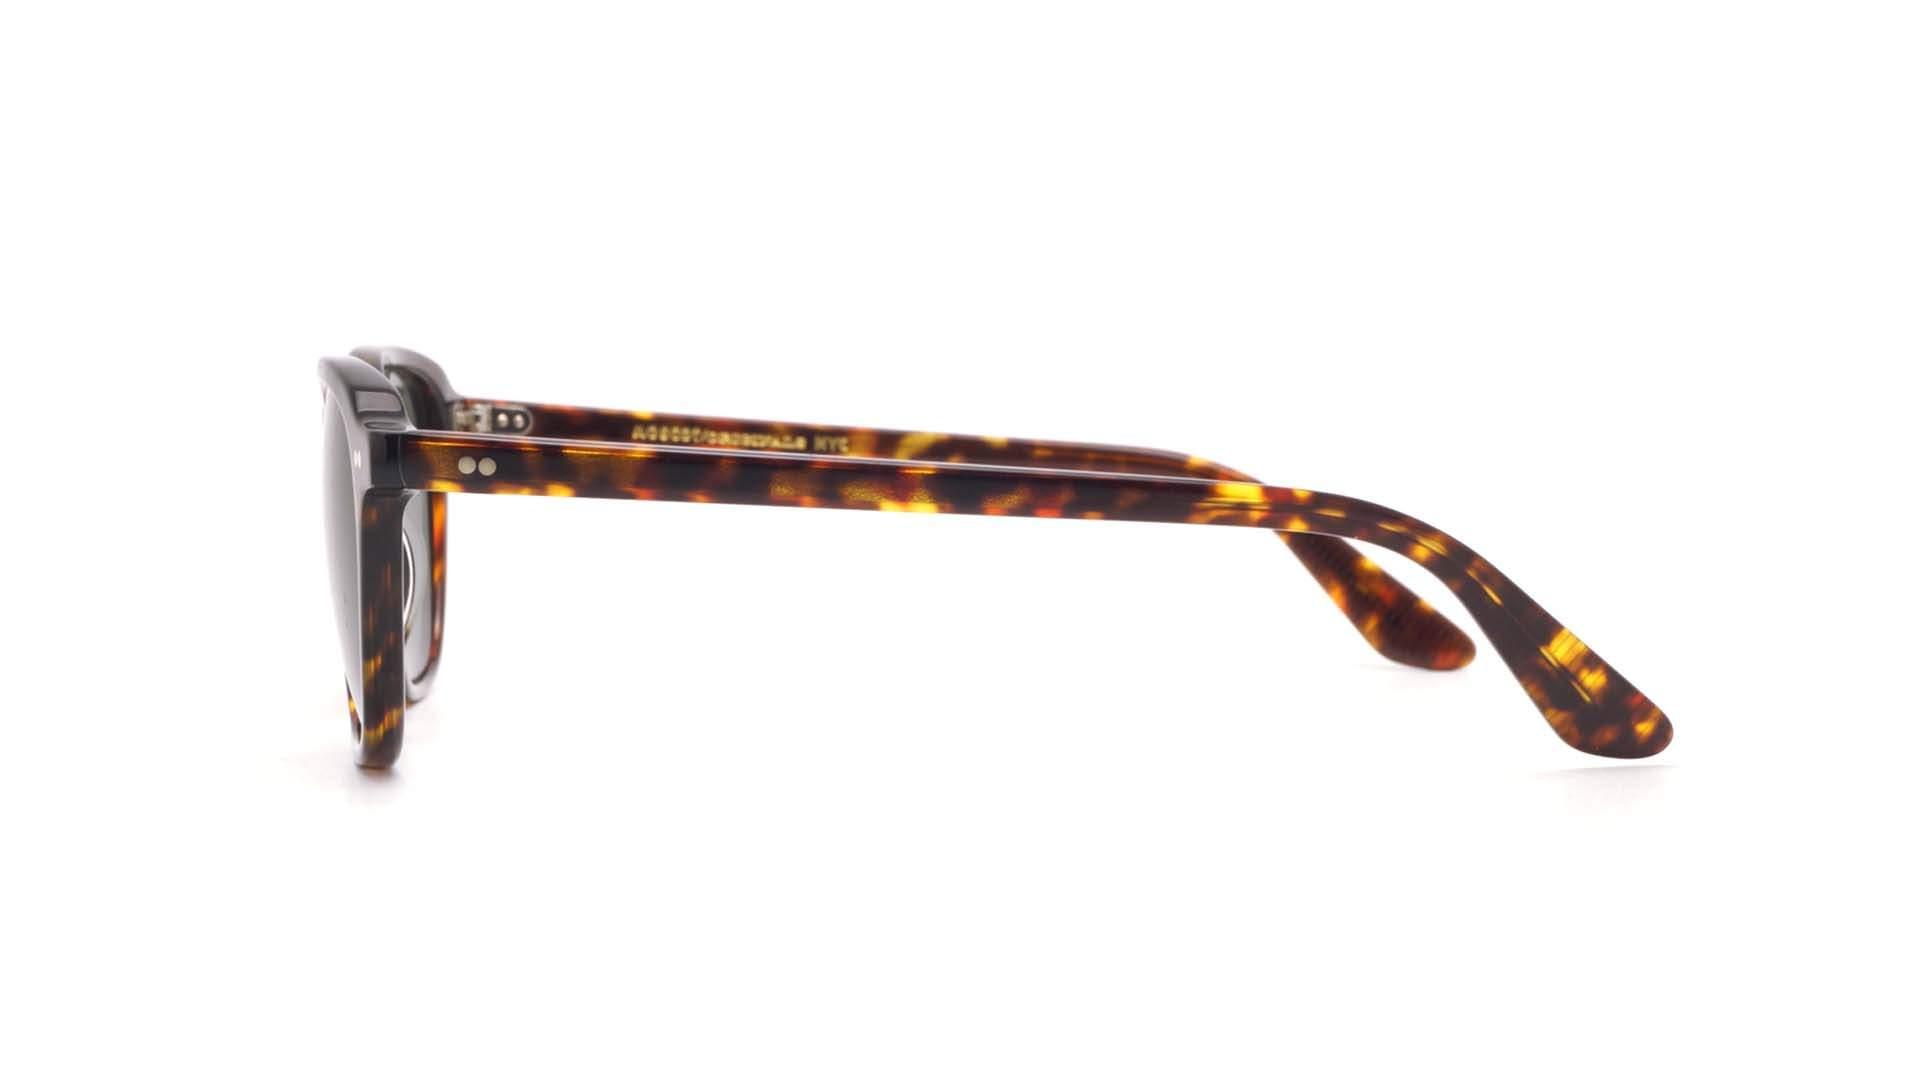 84152e30804 Sunglasses Moscot Billik Tortoise G15 BIL 2002-50-AC-SUN-02 50-23 Medium